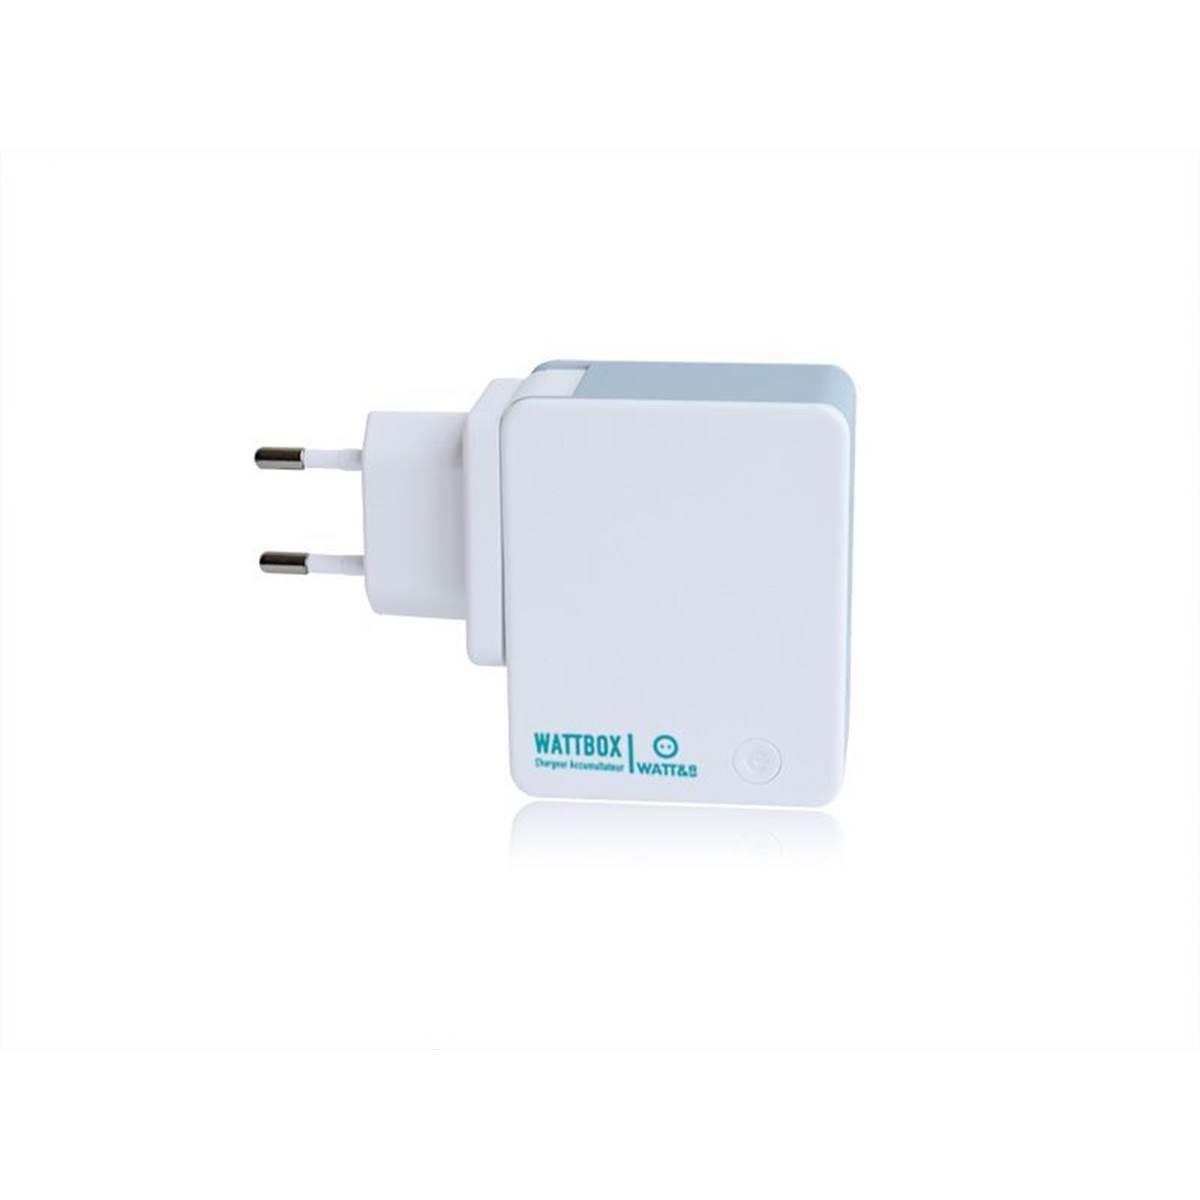 Chargeur secteur Powerbank 2 USB 150 pays Watt&Co